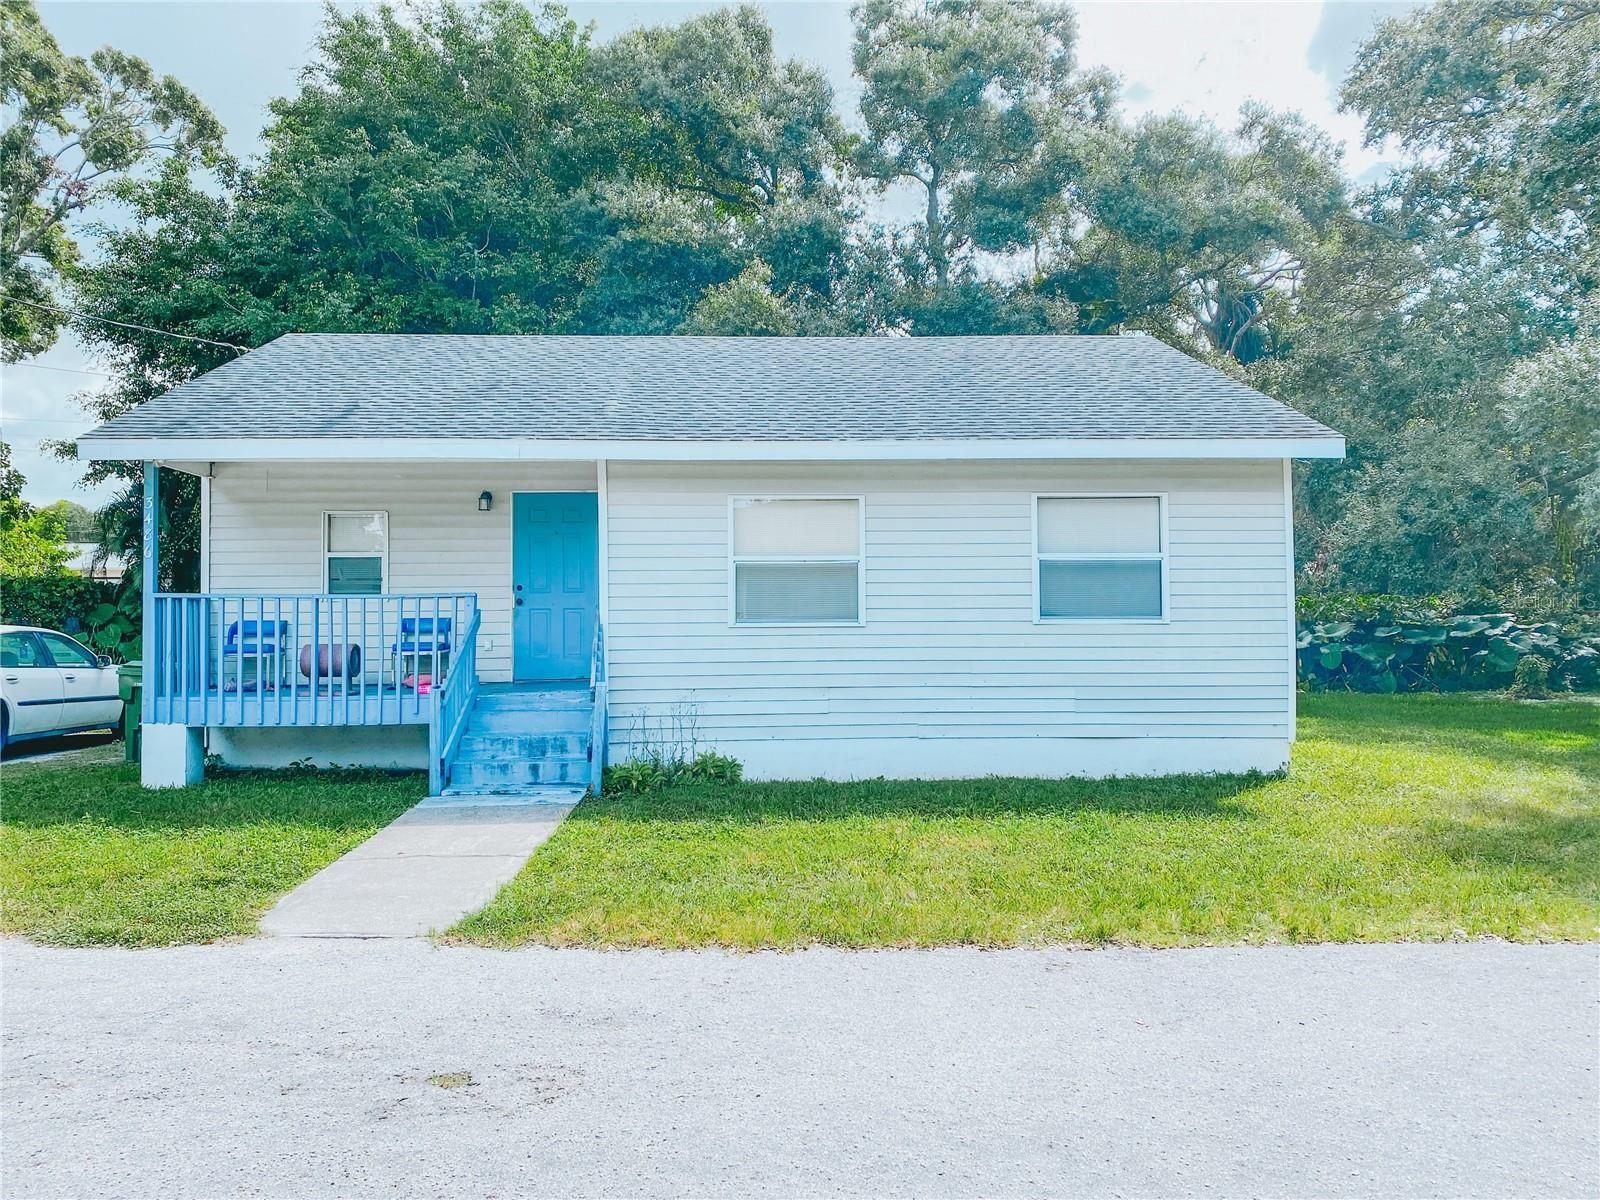 Photo of 3476 WINTON AVENUE, SARASOTA, FL 34234 (MLS # A4512510)